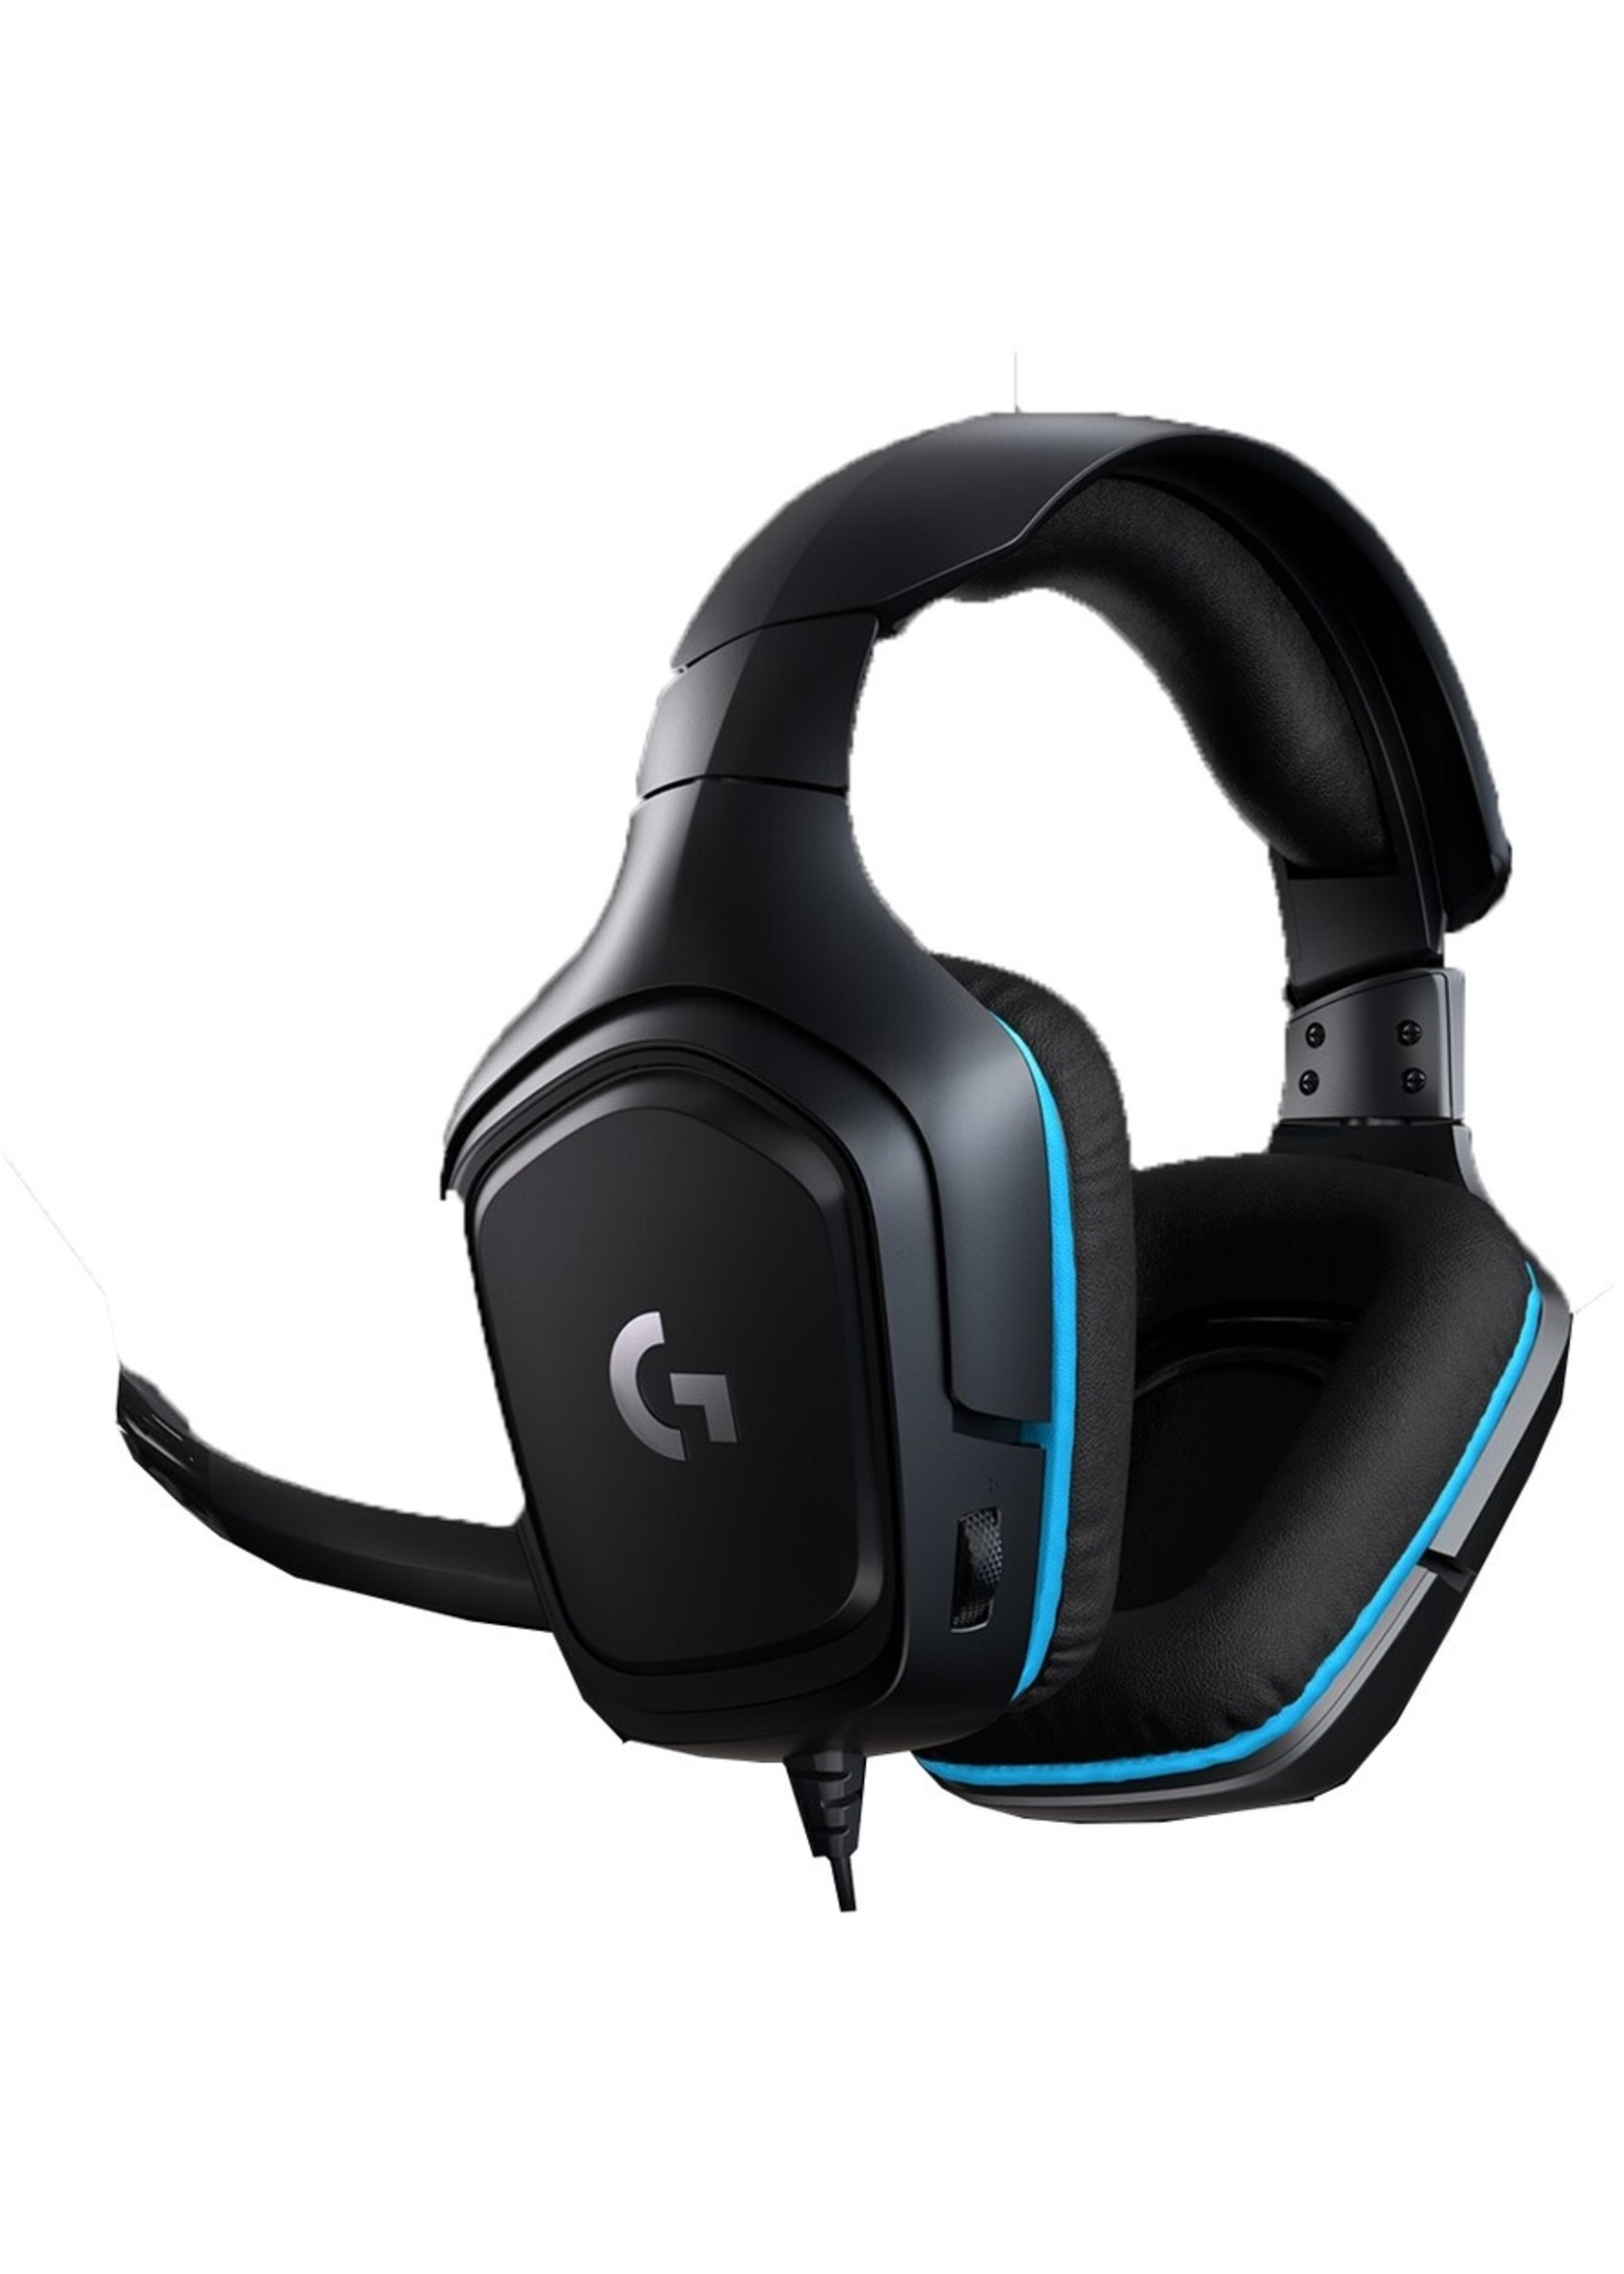 Logitech G432 DTS:X 7.1 Surround Sound Gaming Headset